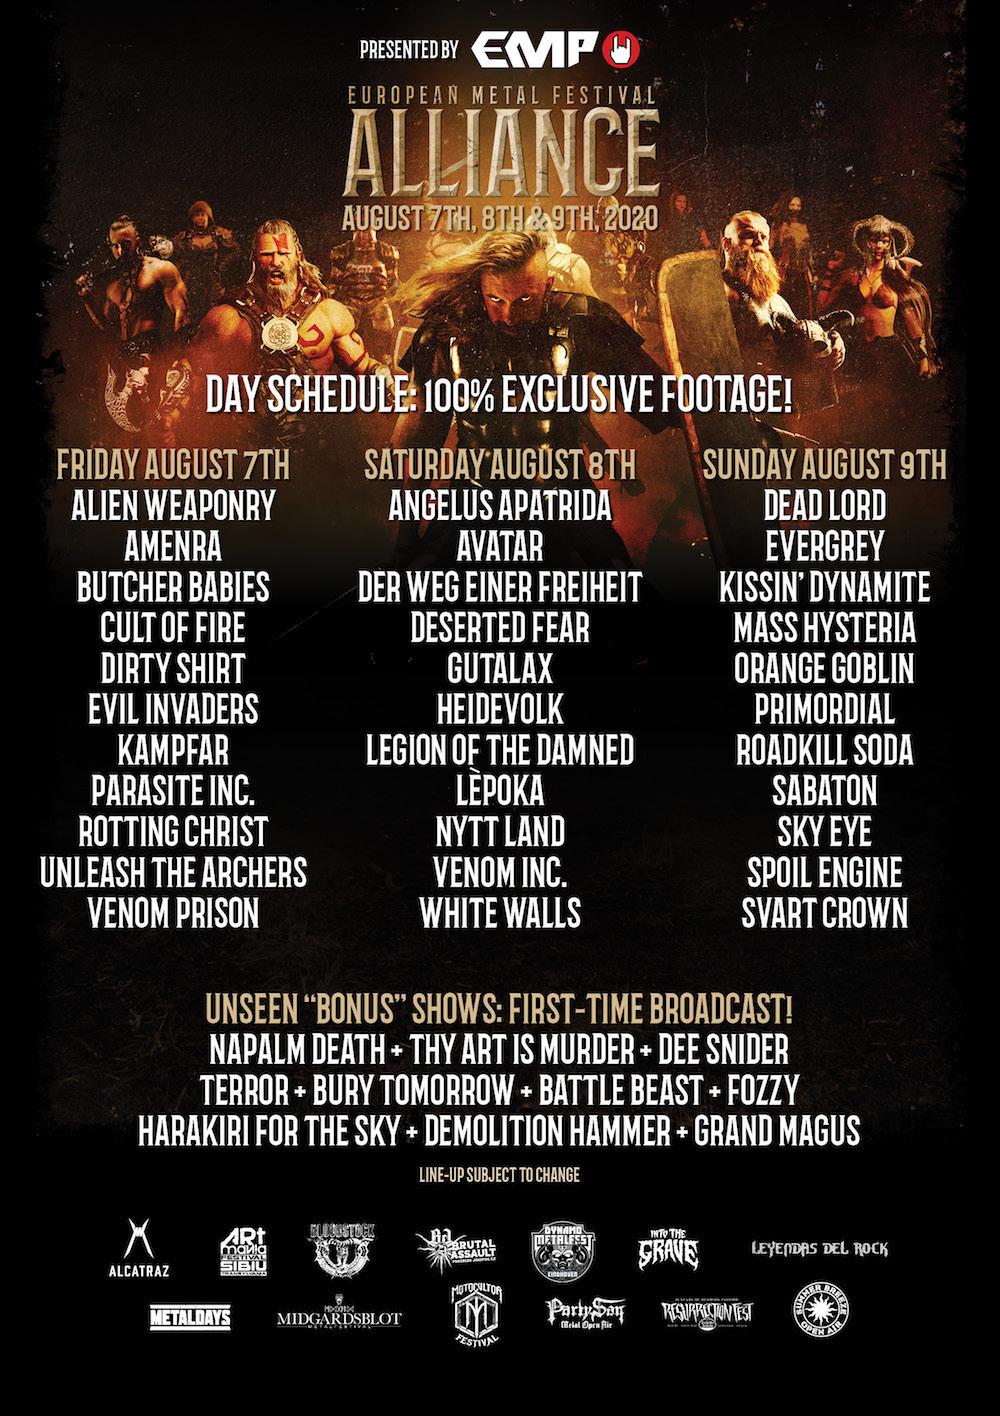 European Metal Festival Alliance 2020 (オンラインイベント) が今週末に開催_b0233987_21231848.jpg